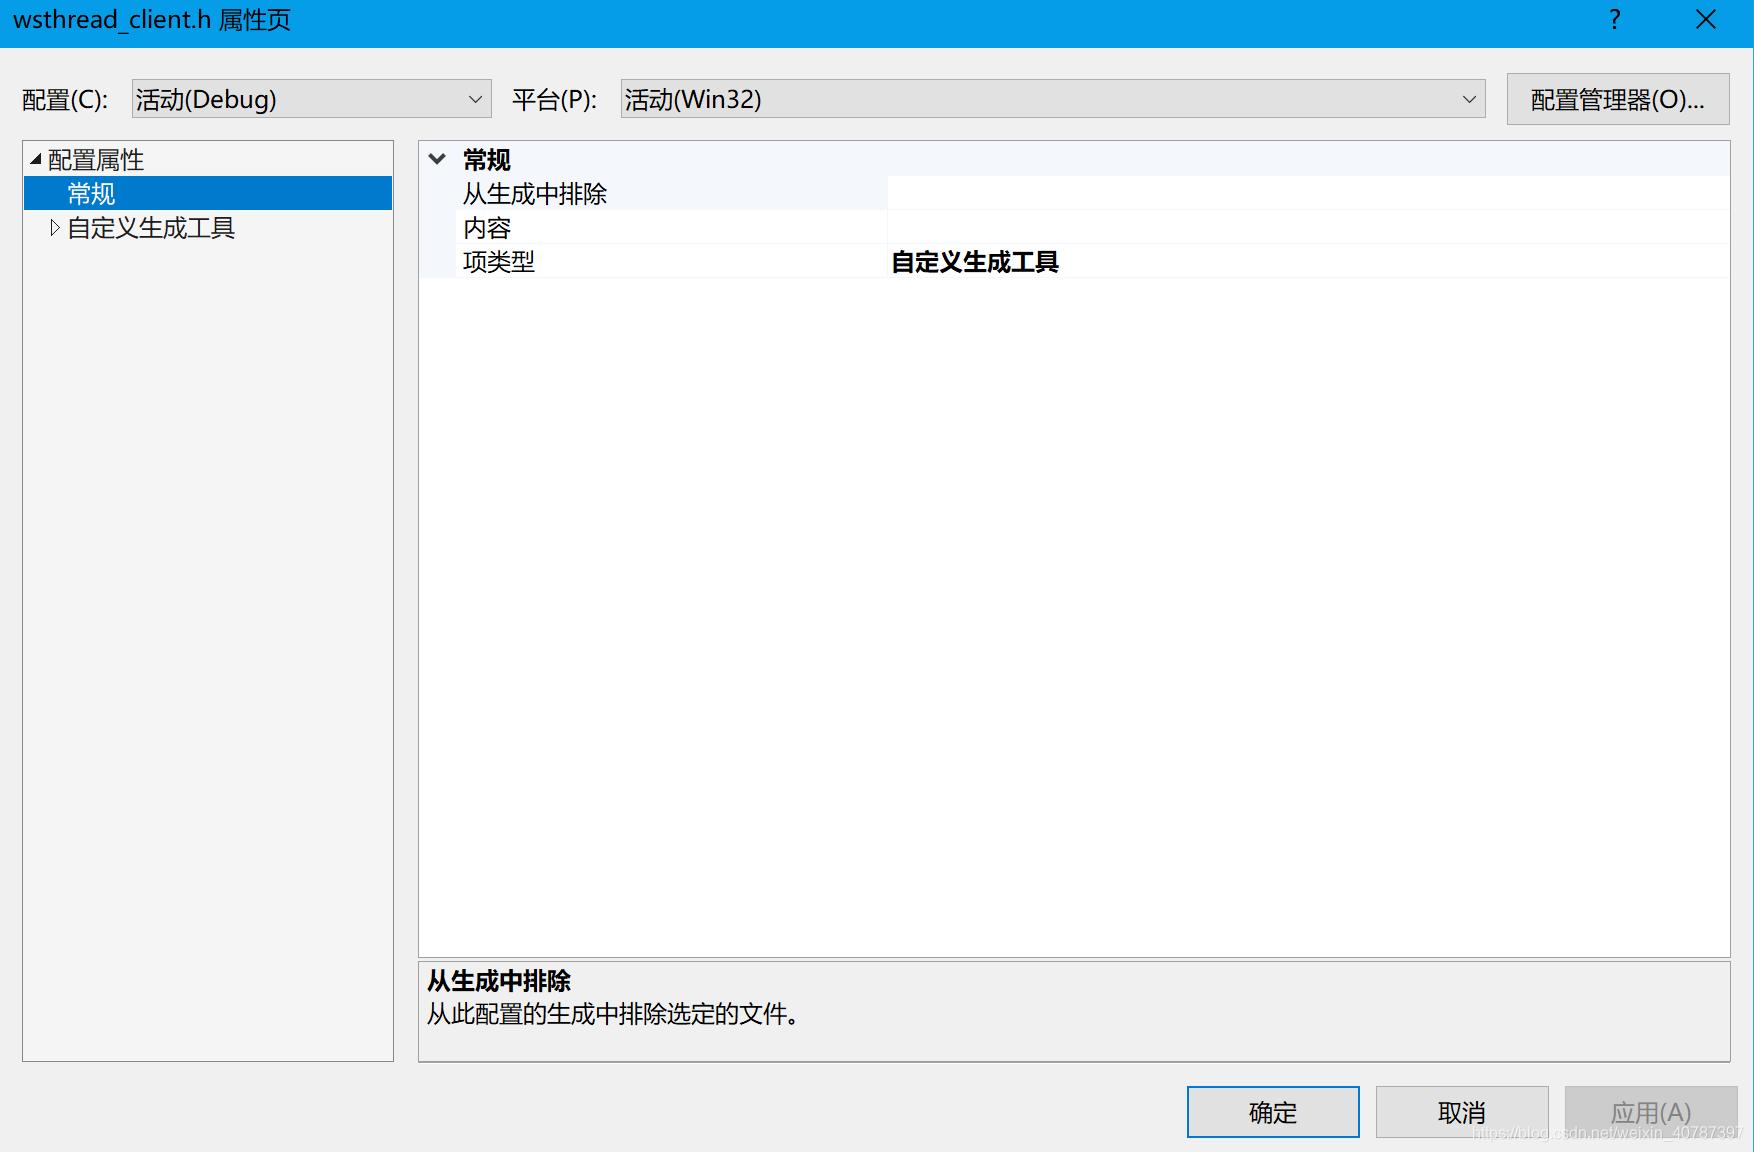 VS2017 下QT工程不能生成moc文件的解决方法- weixin_40787397的